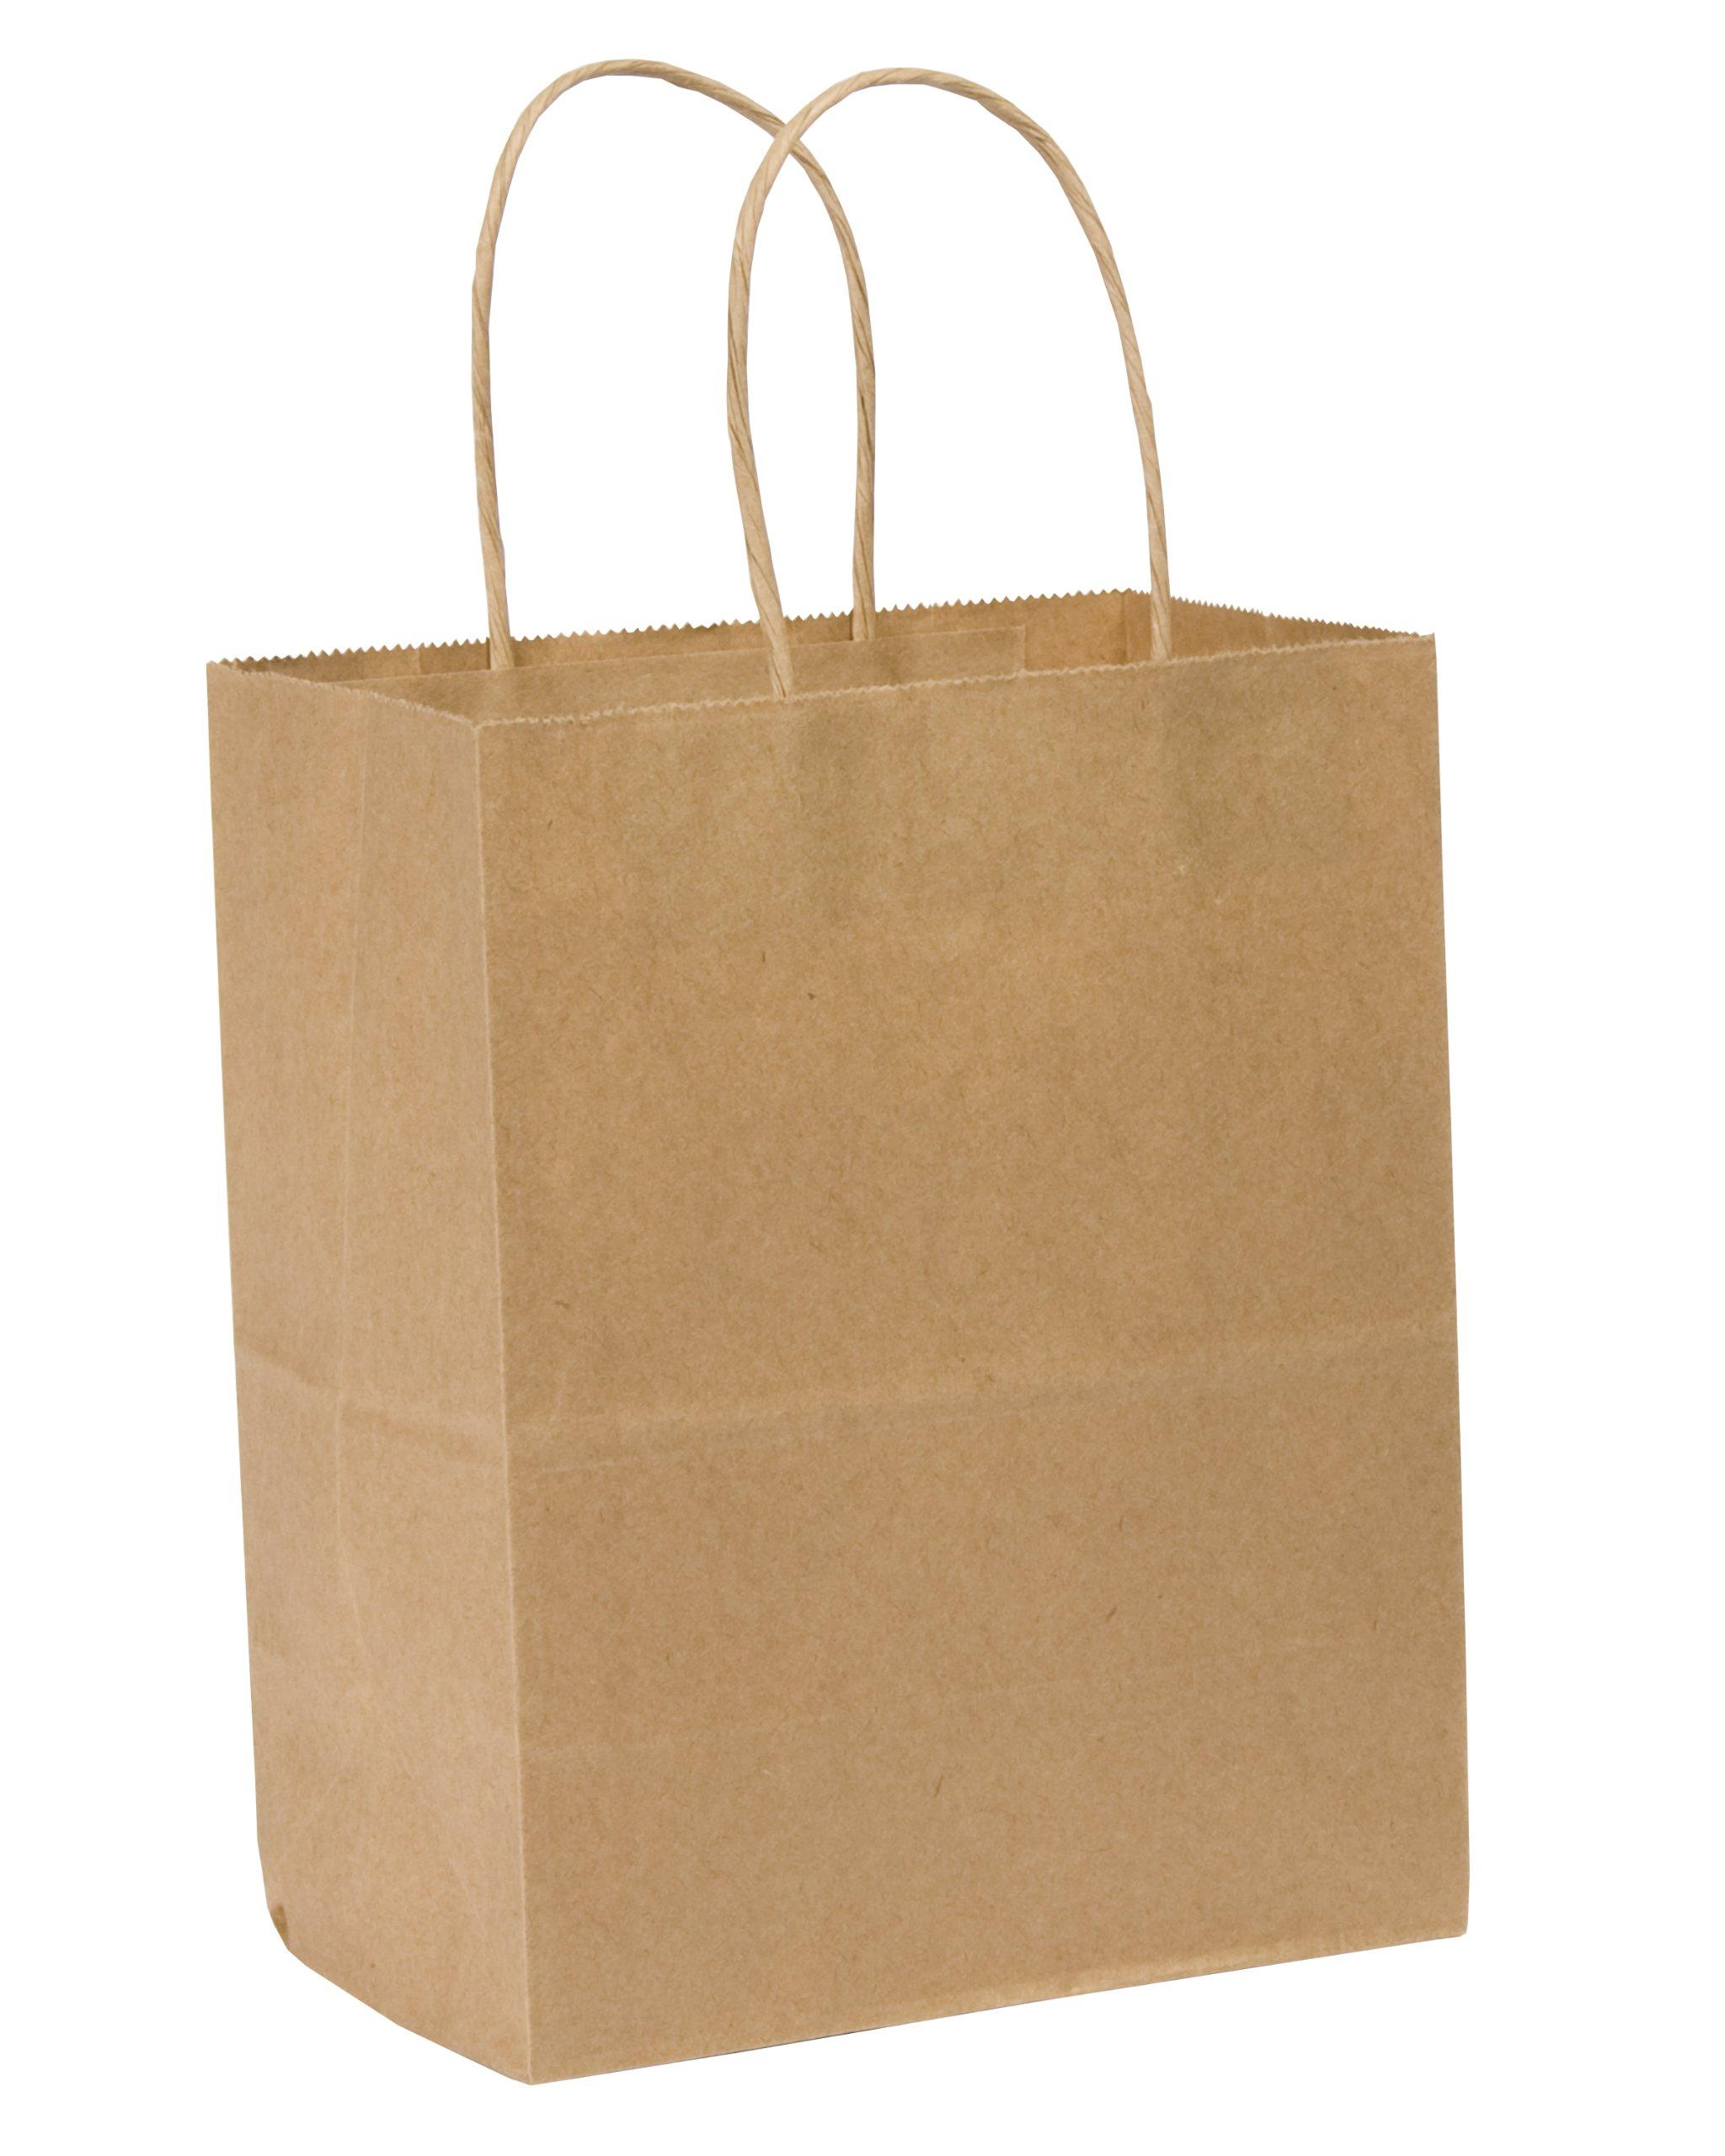 store paper bags